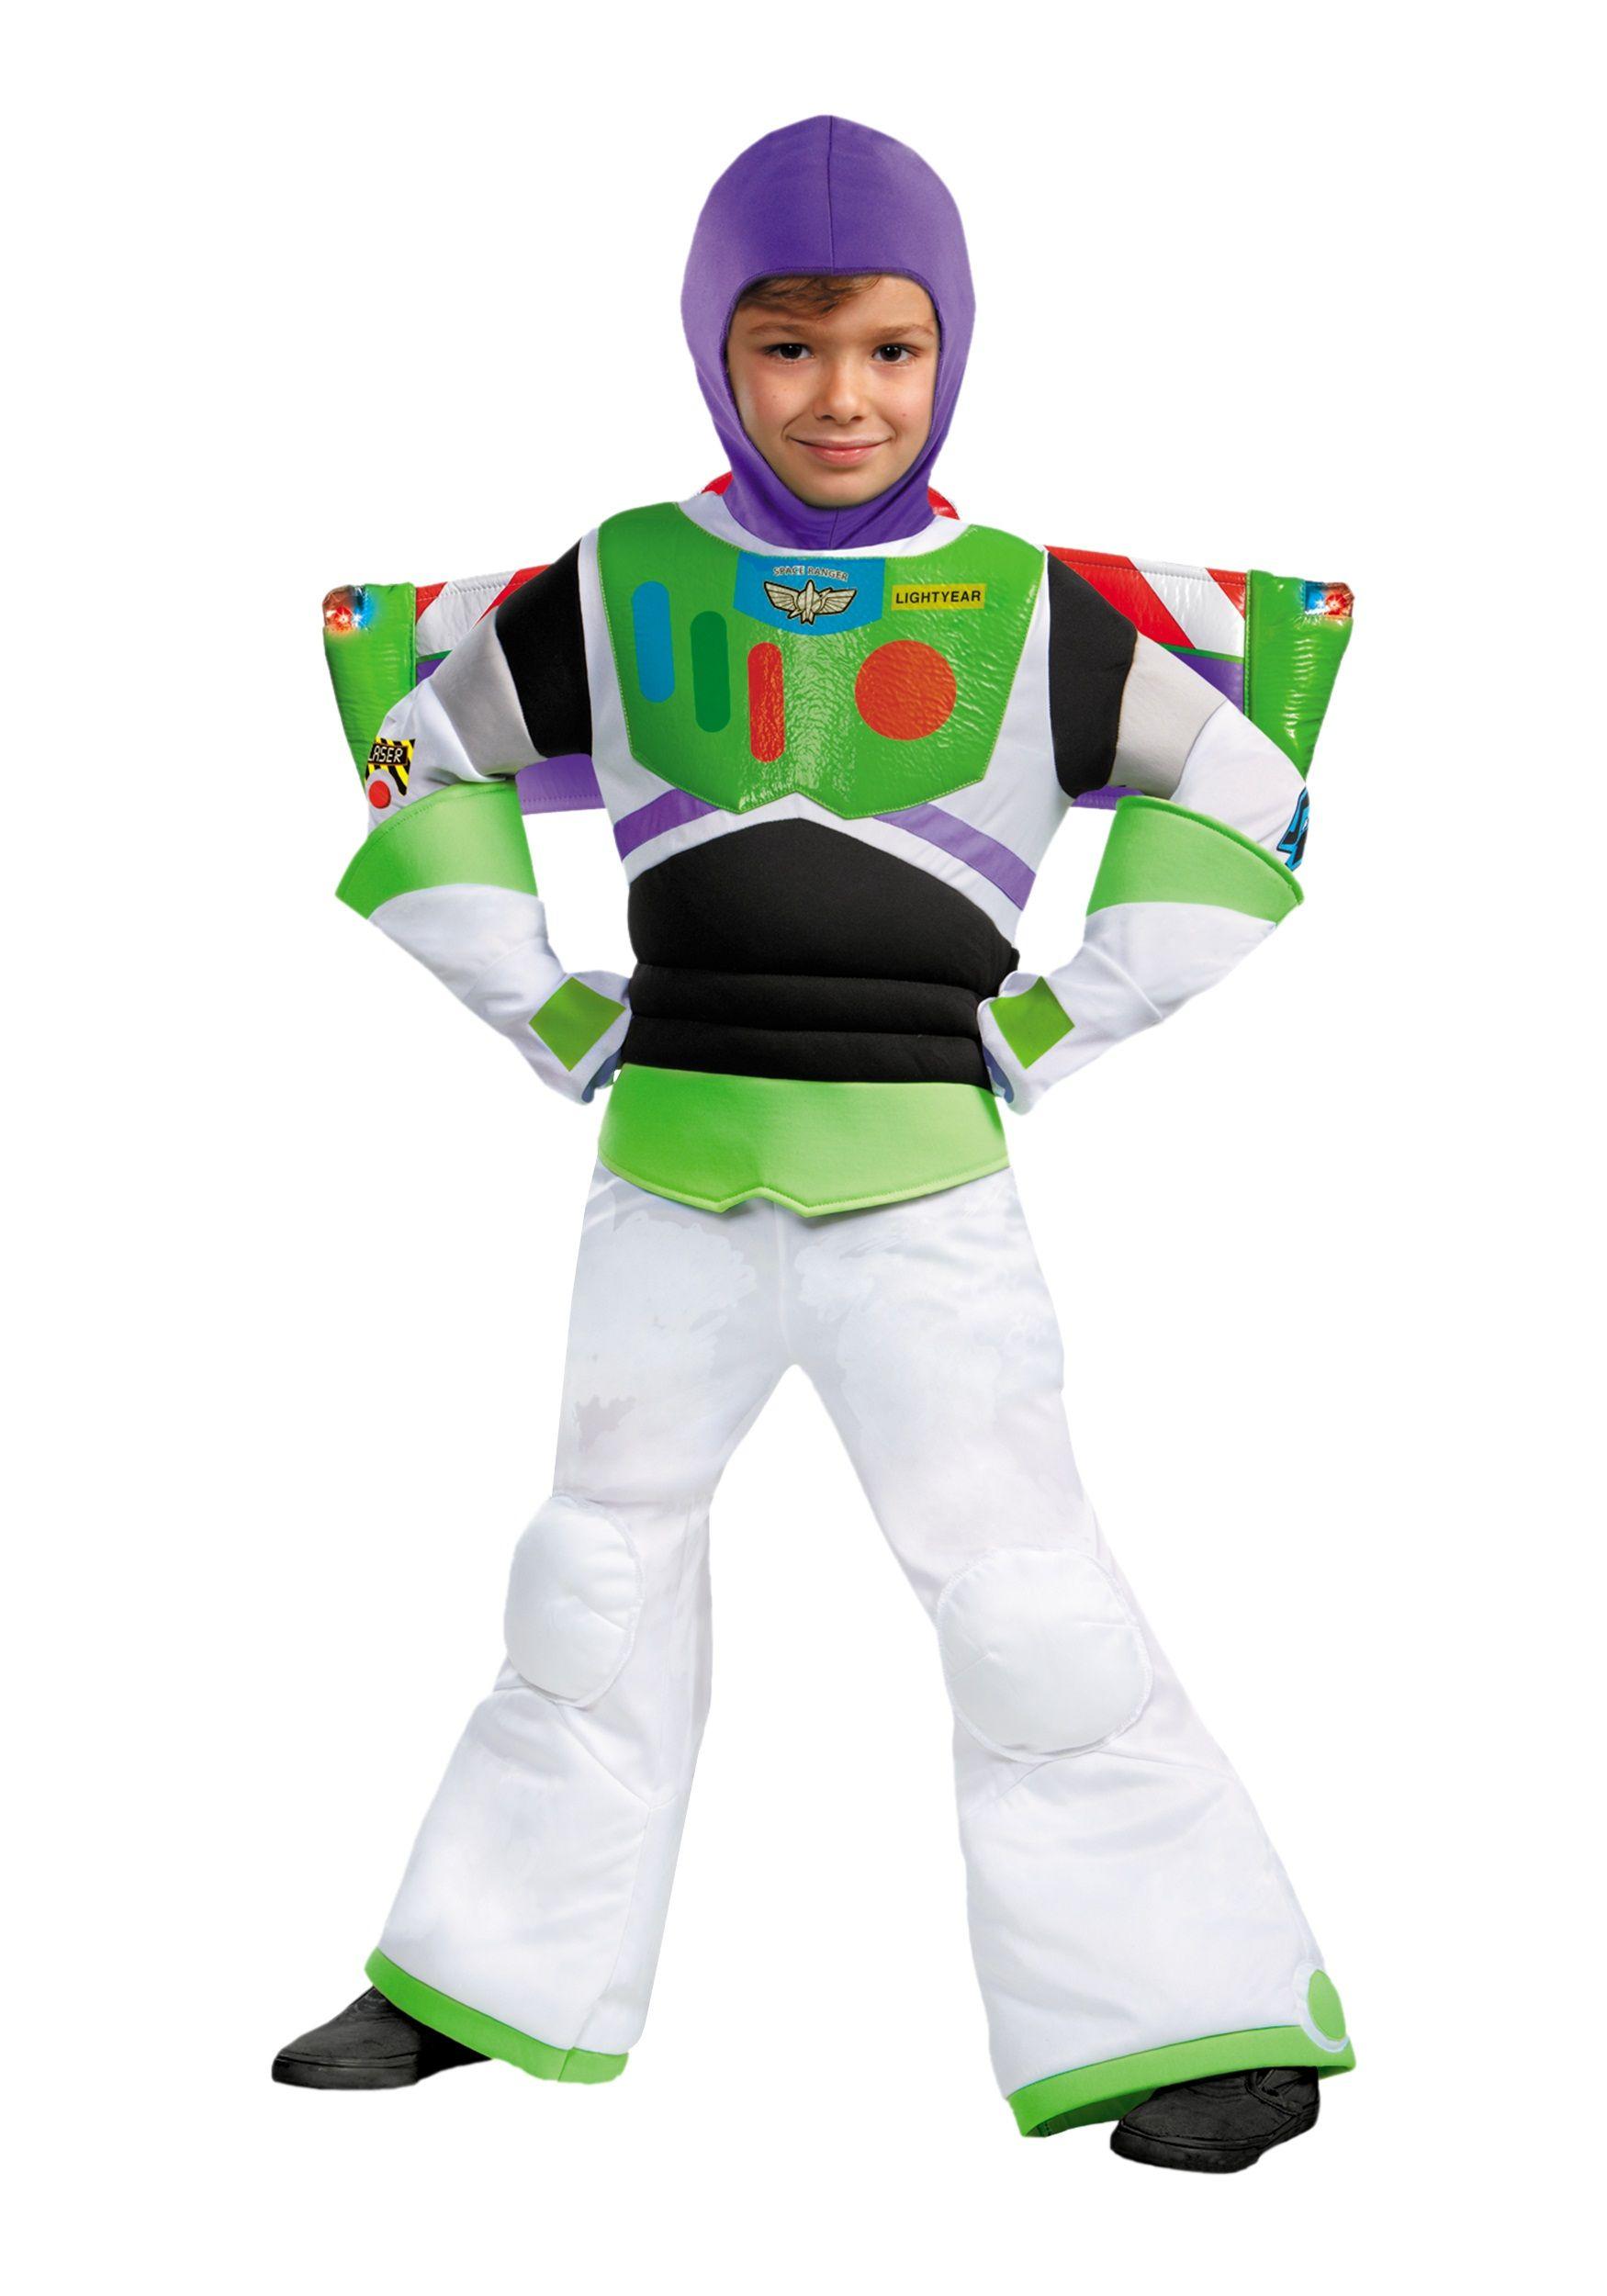 httpimageshalloweencostumescomproducts29801 2child deluxe buzz lightyear costumejpg halloween pinterest buzz lightyear costume